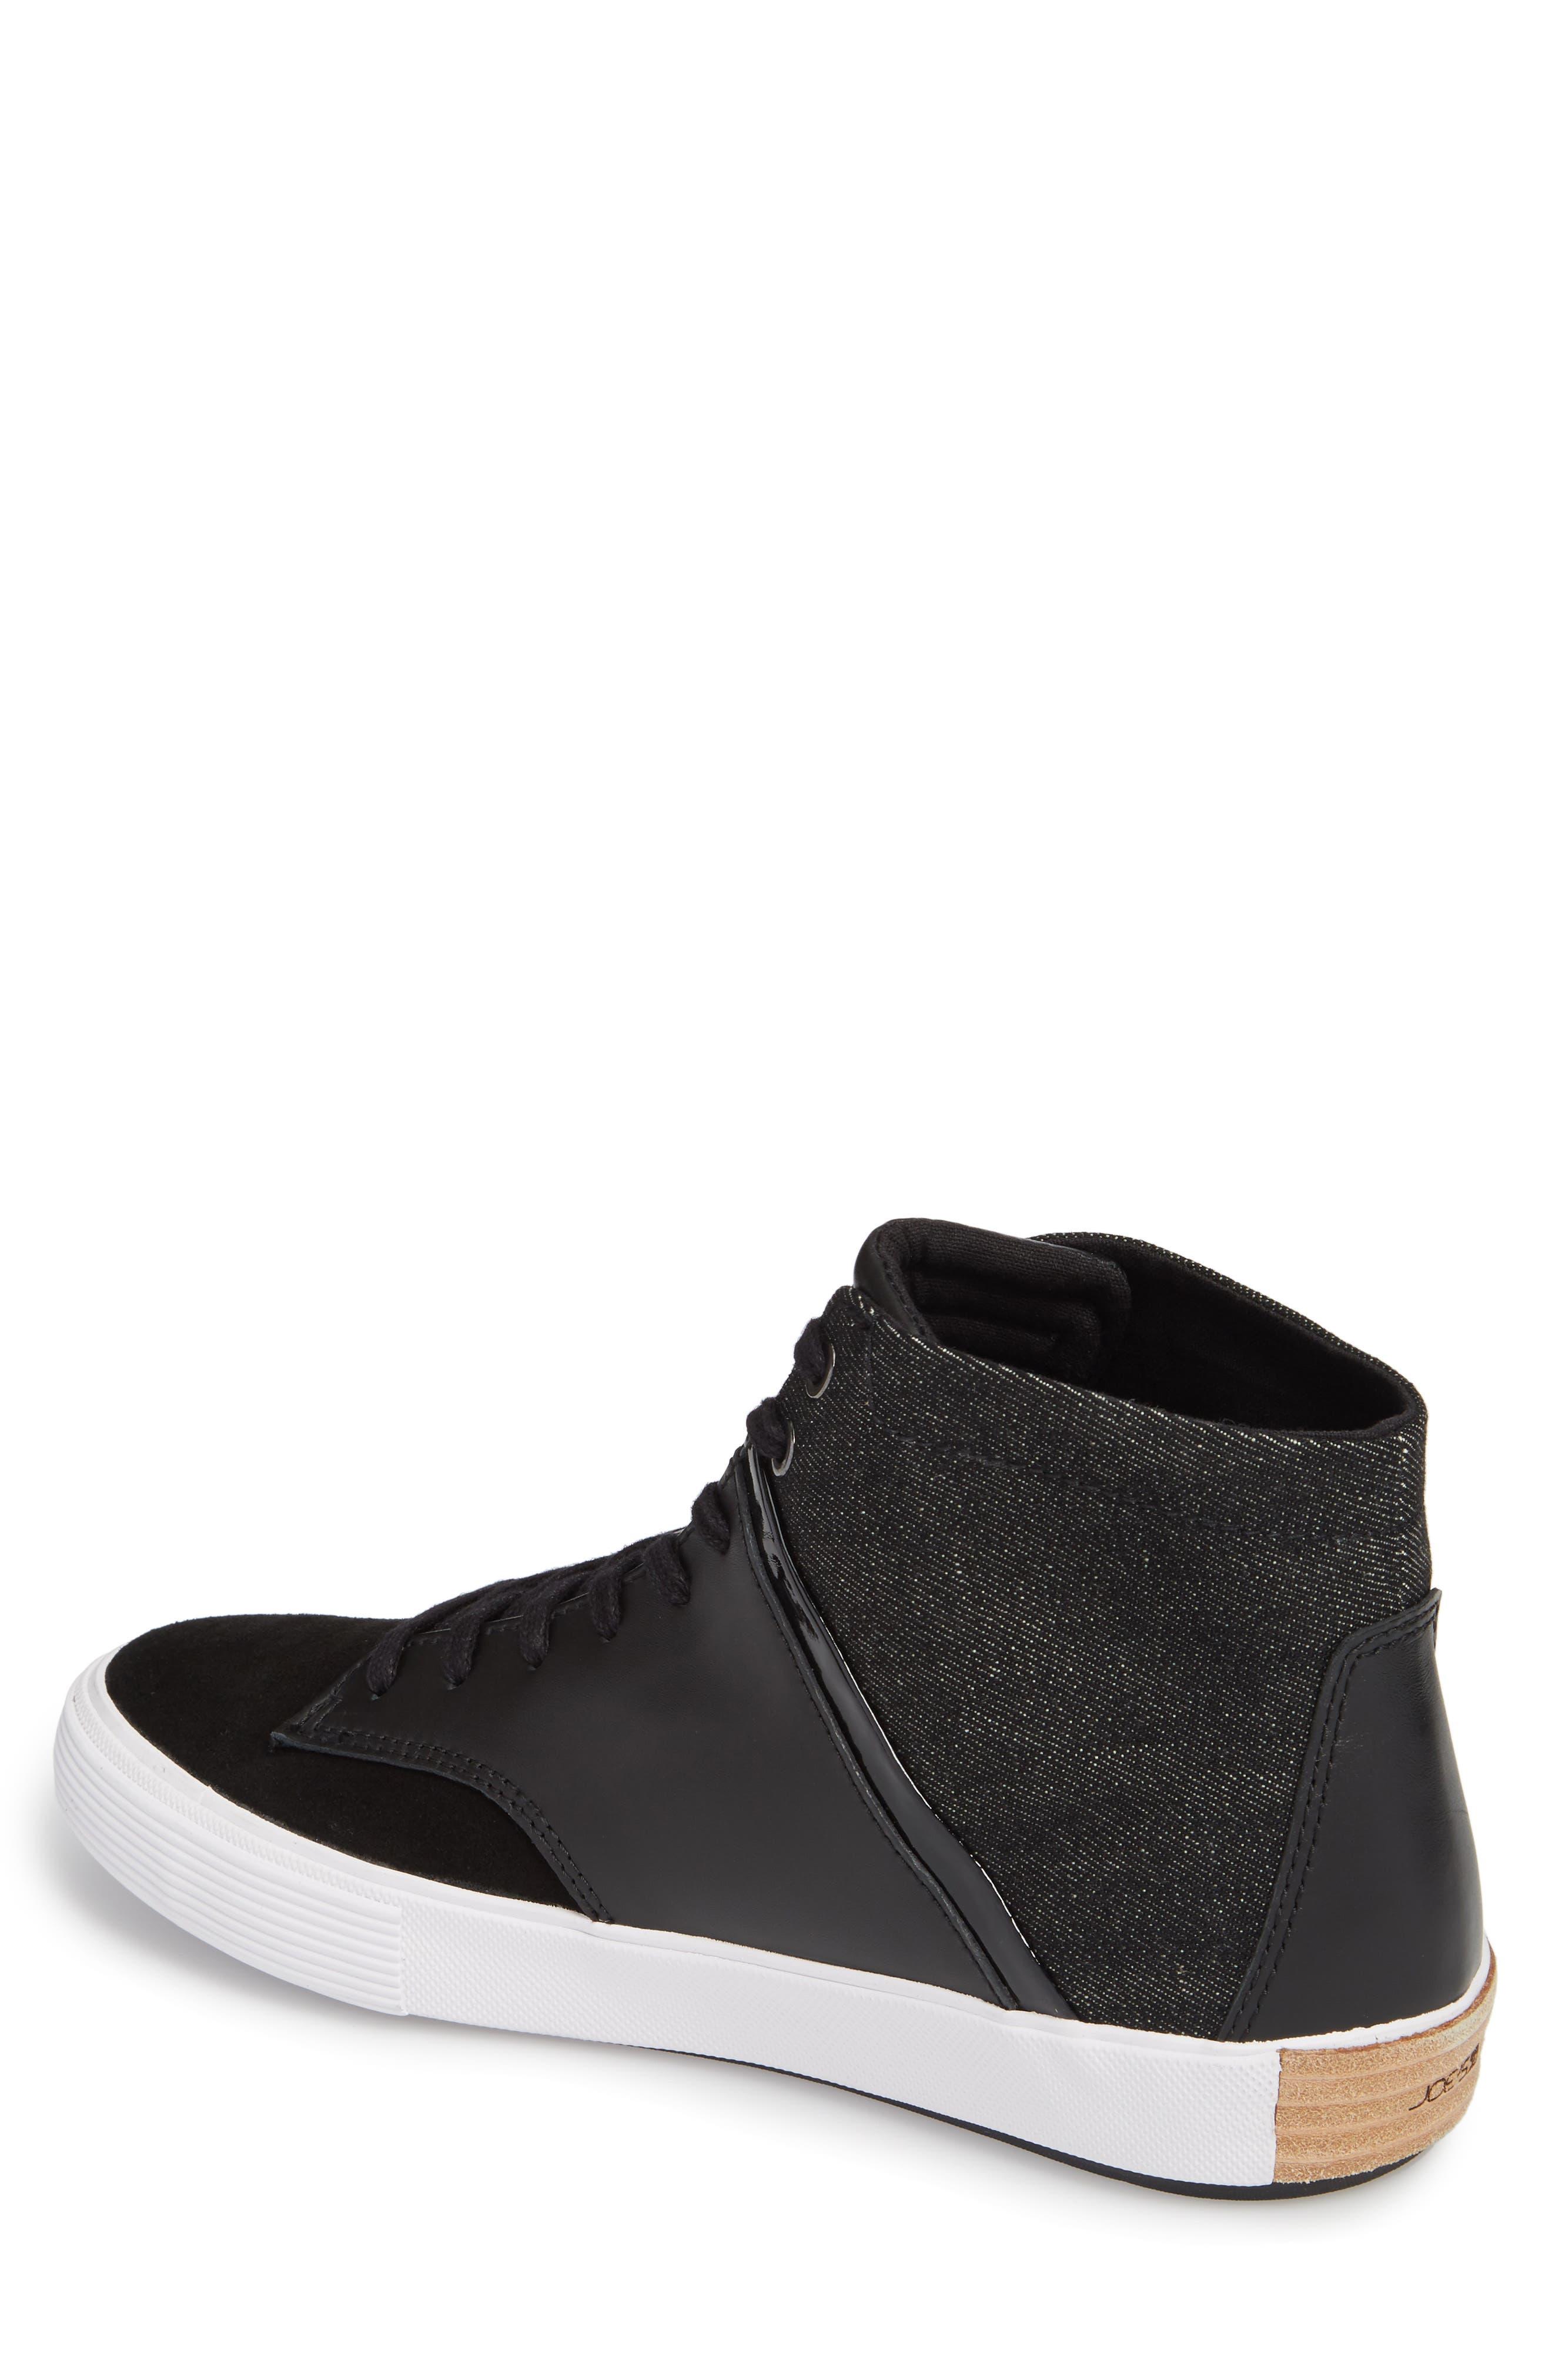 Joe Mac High Top Sneaker,                             Alternate thumbnail 2, color,                             Black Leather